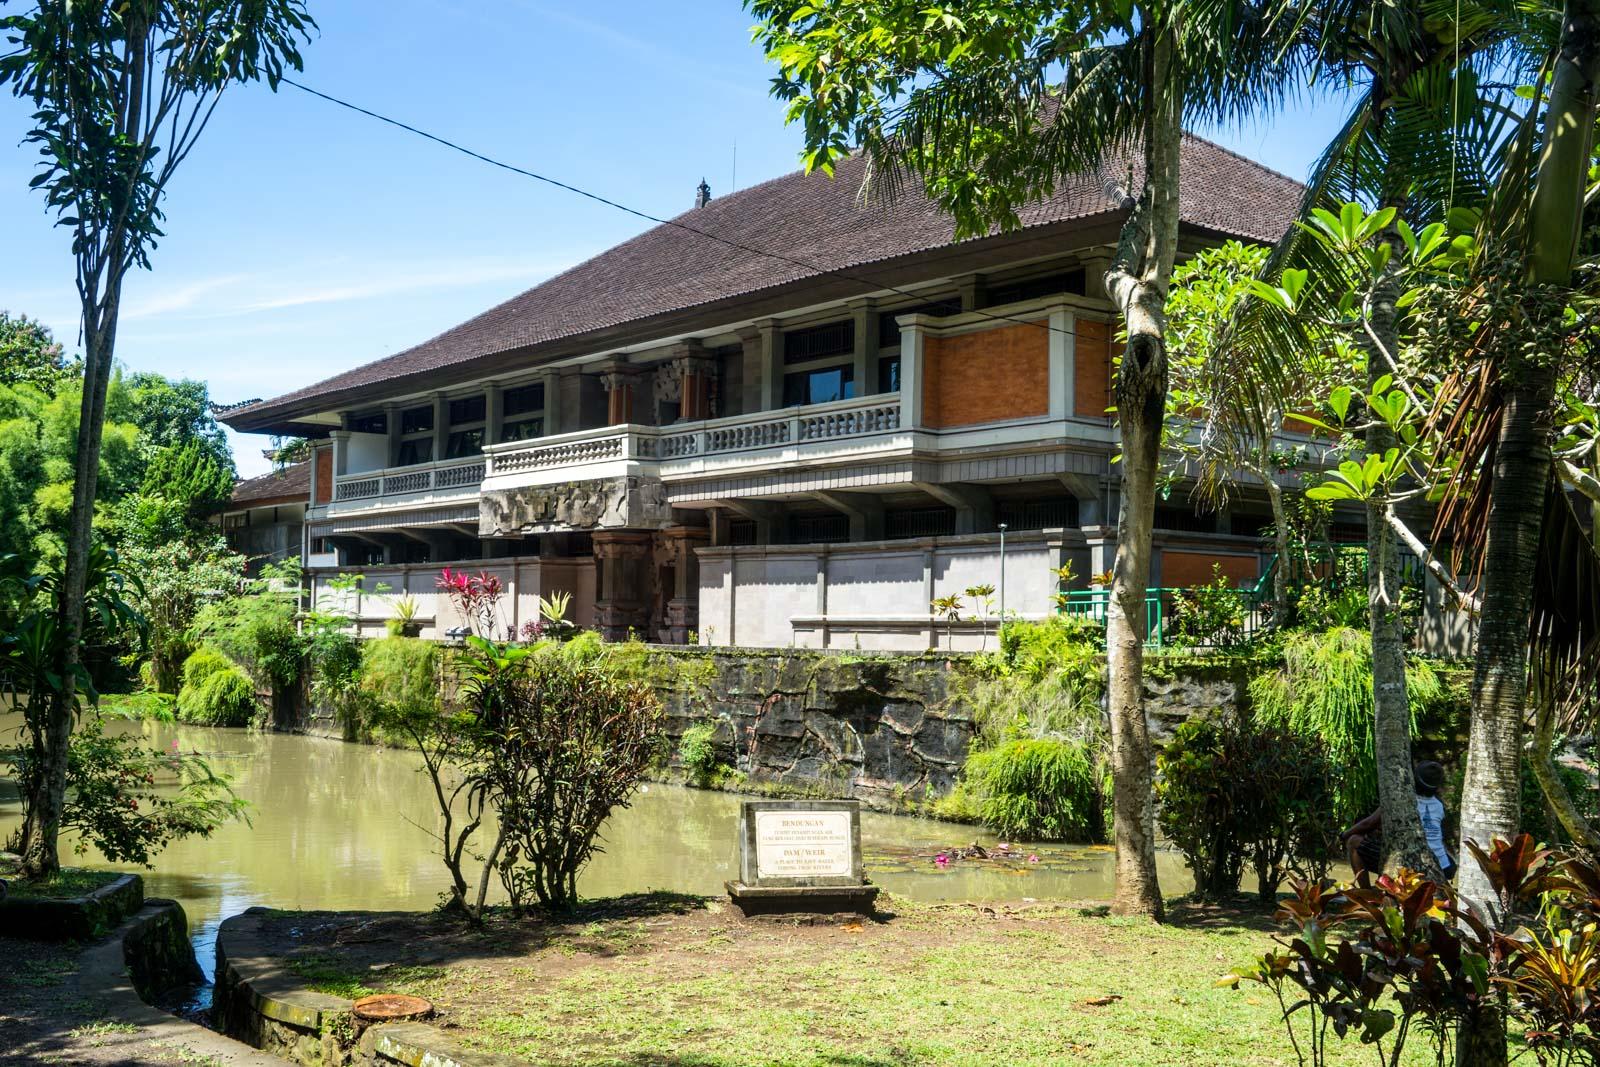 Subak Museum, Bali, Indonesia